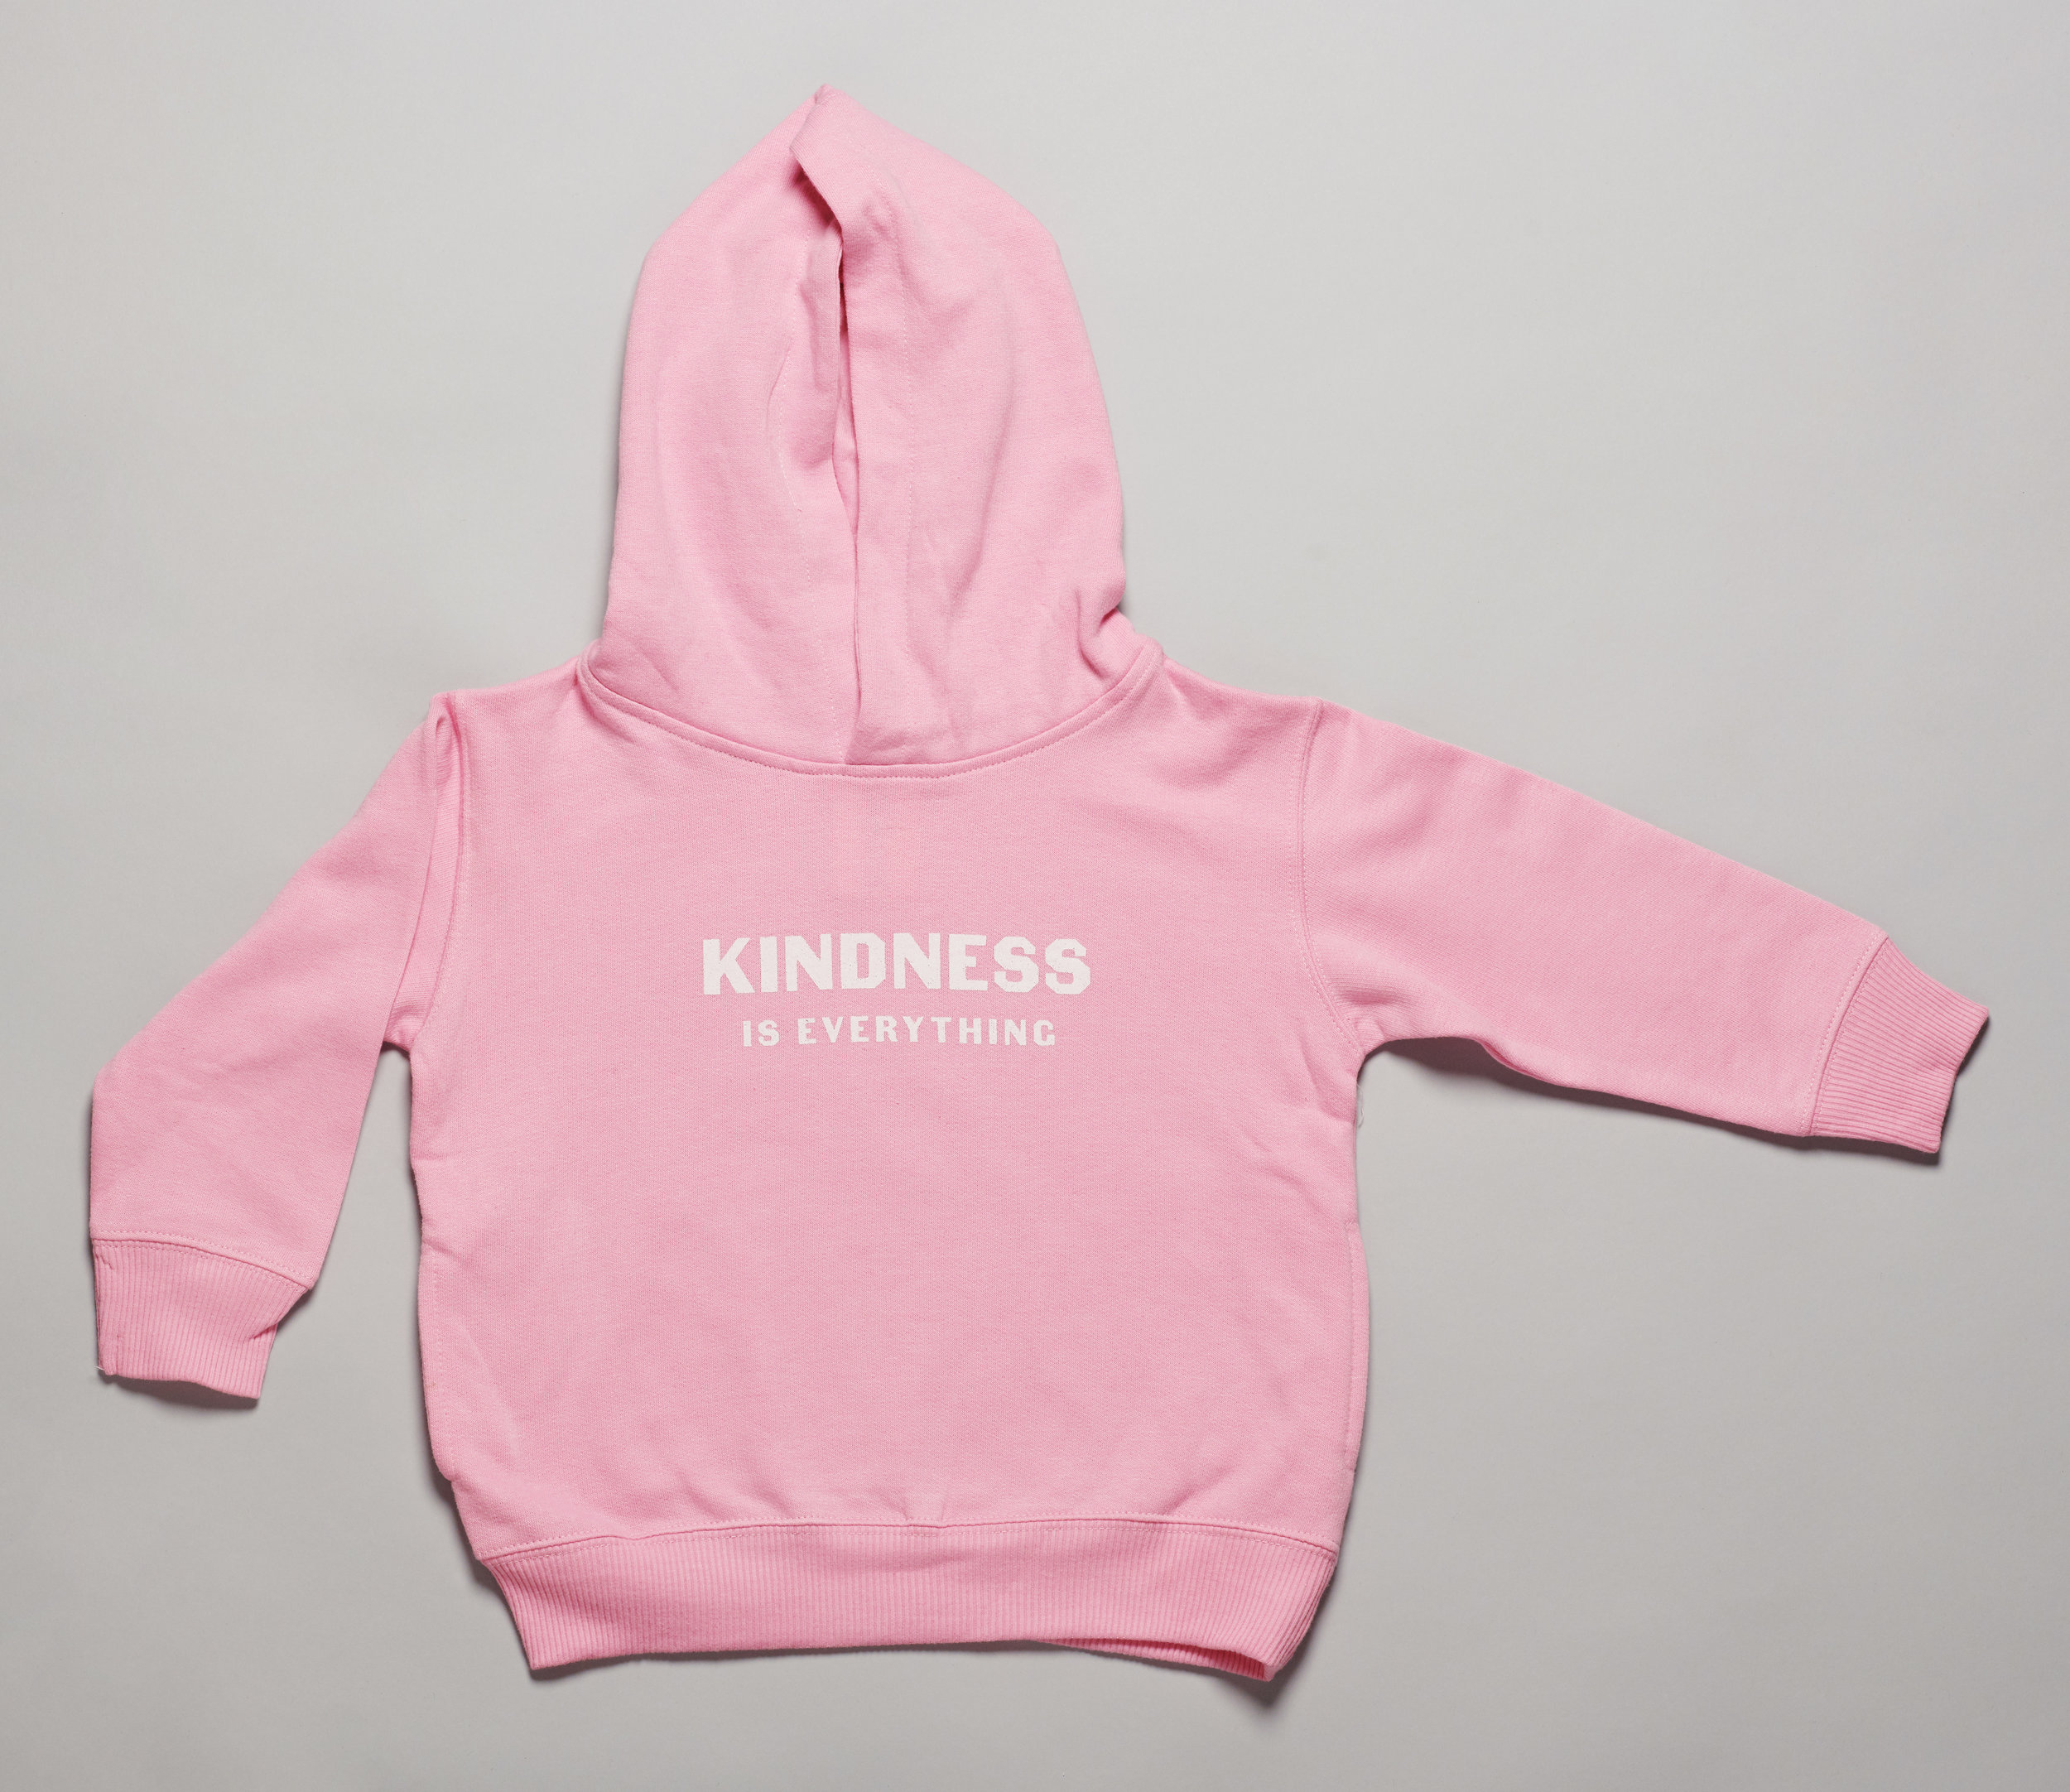 Kindness is Everything Sweatshirt